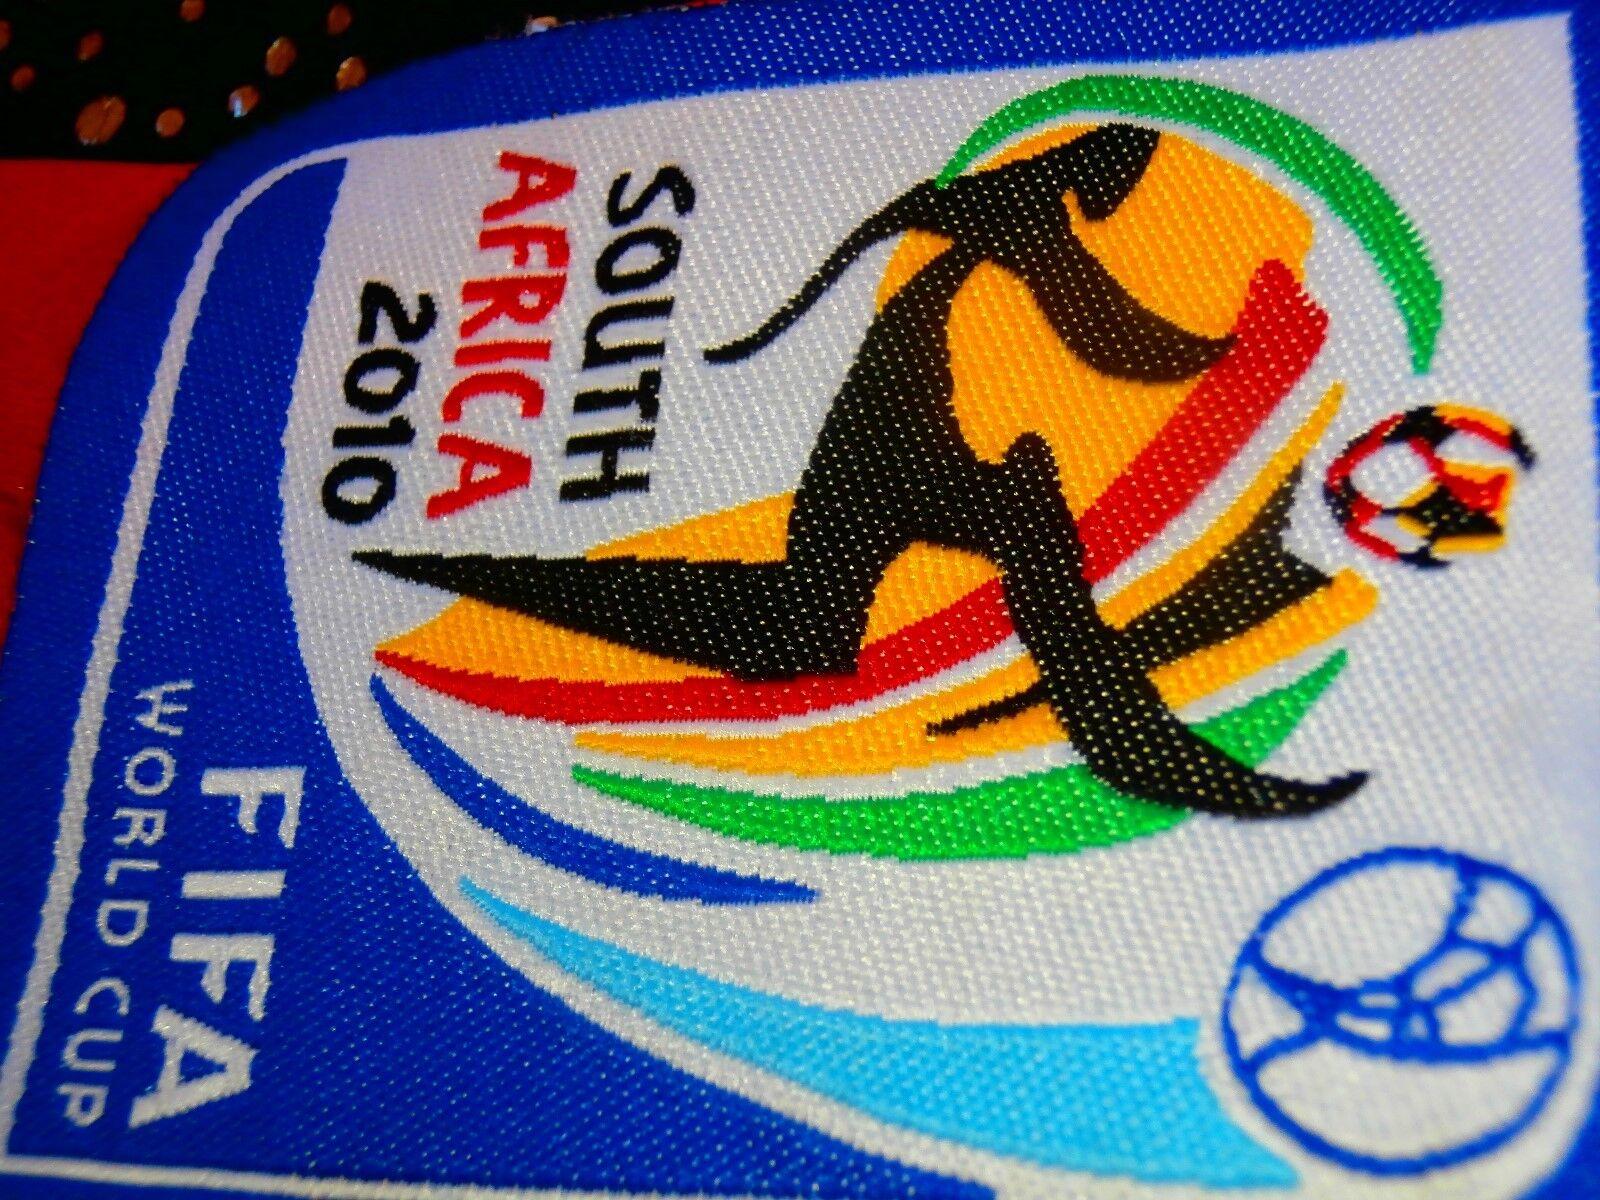 ADIDAS SPAIN 2010 World CUP CHAMPIONS SOCCER FOOTBtutti JERSEY XL  15 SERGIO RAMOS